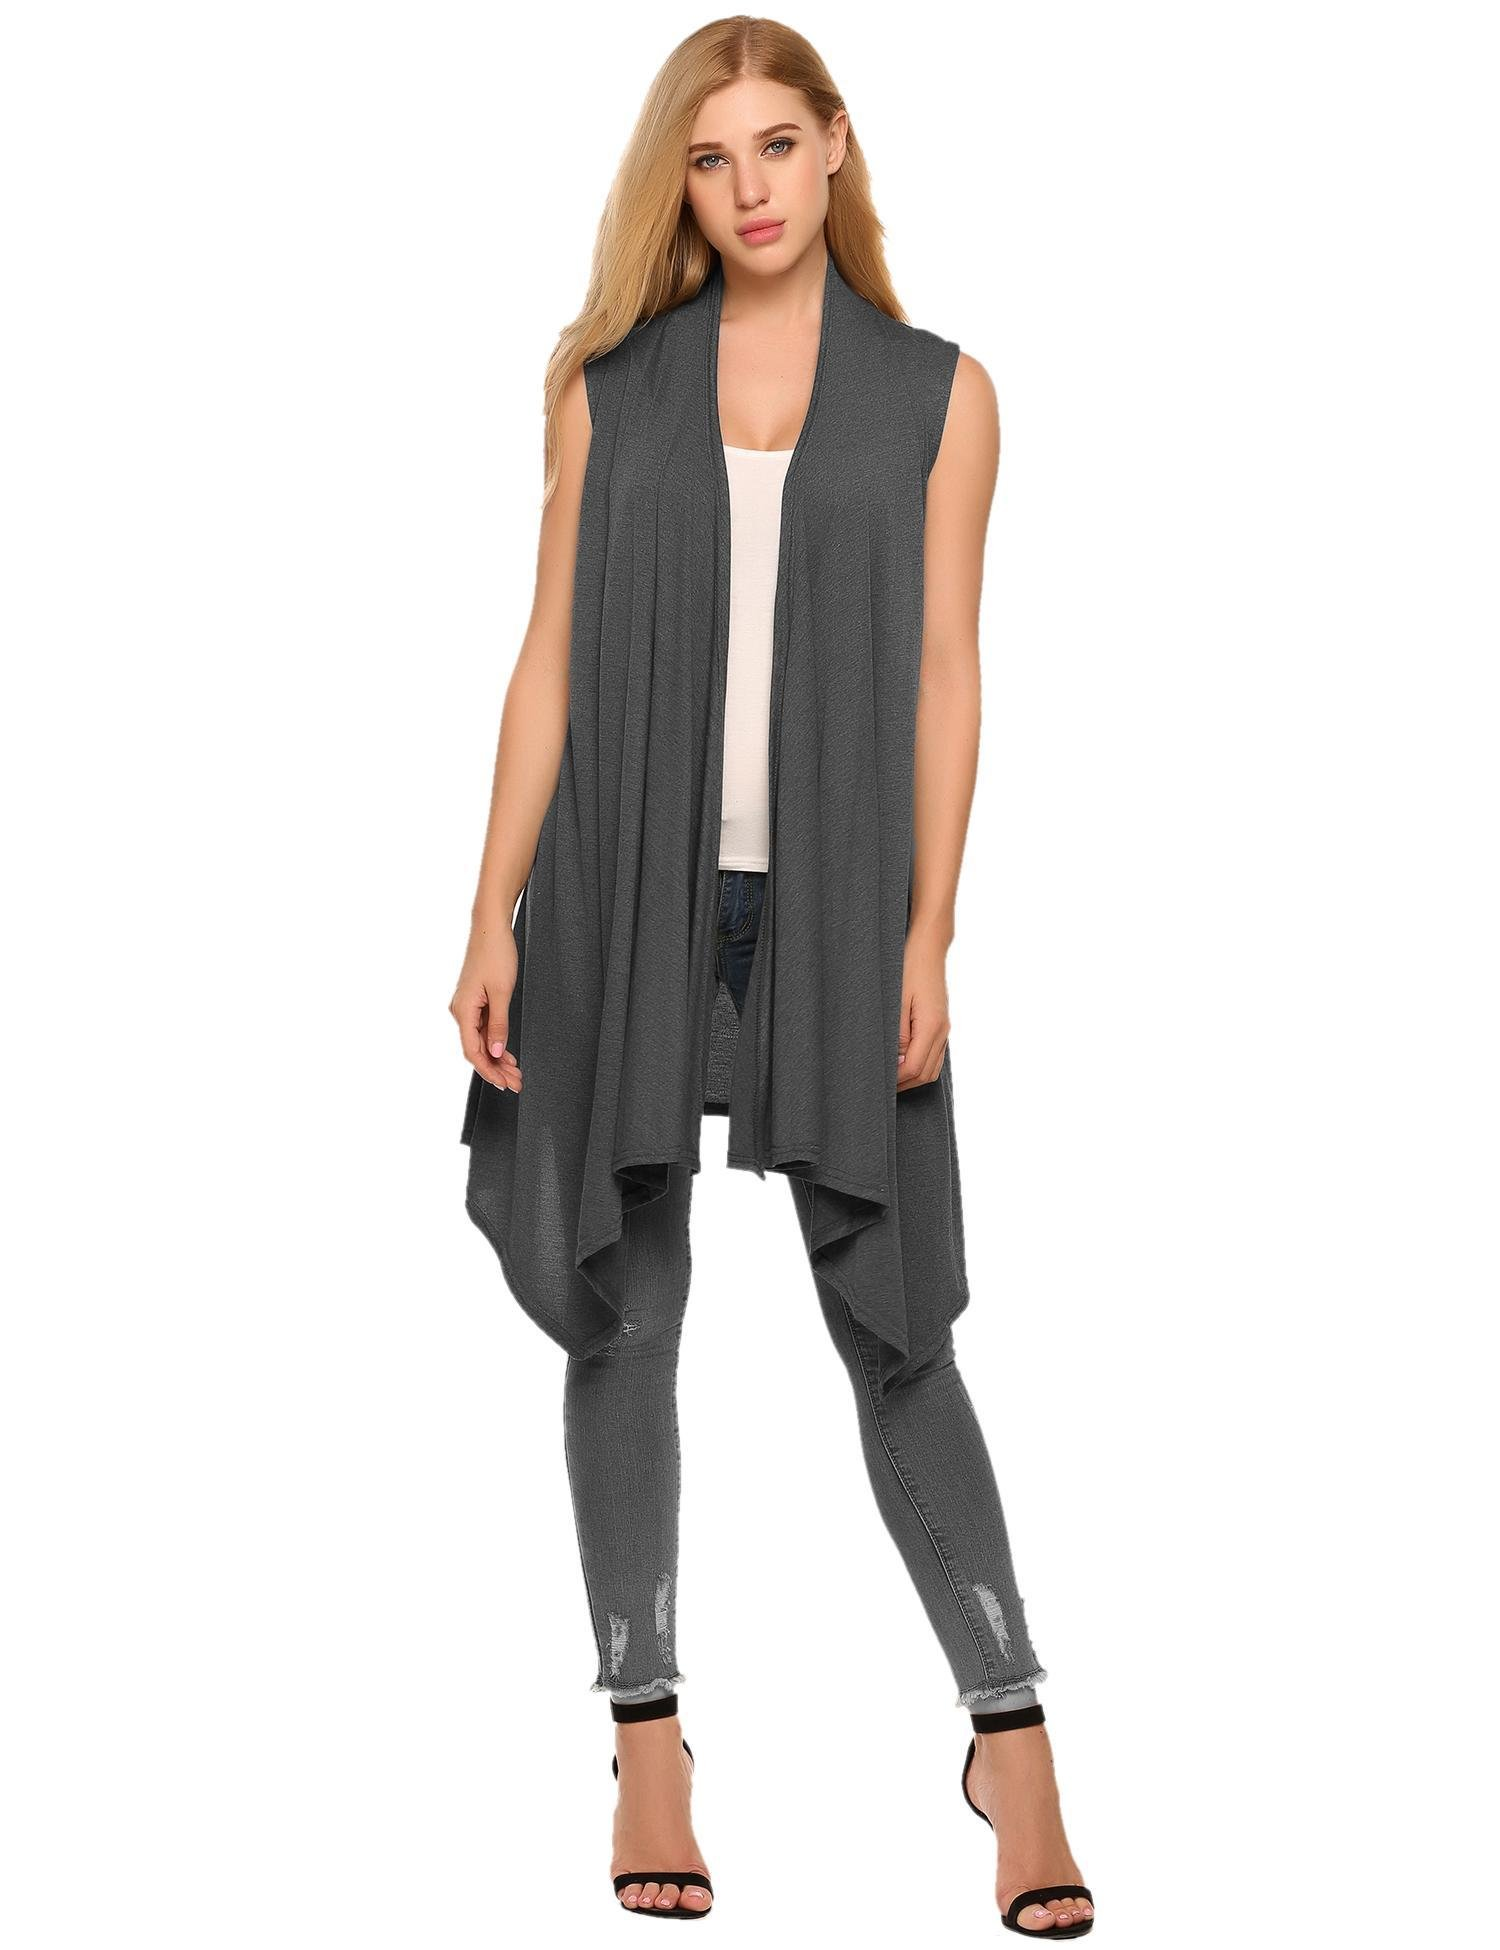 Bifast Women's Solid Color Sleeveless Asymetric Hem Open Front Cardigan Vest Lightweight Cardigan